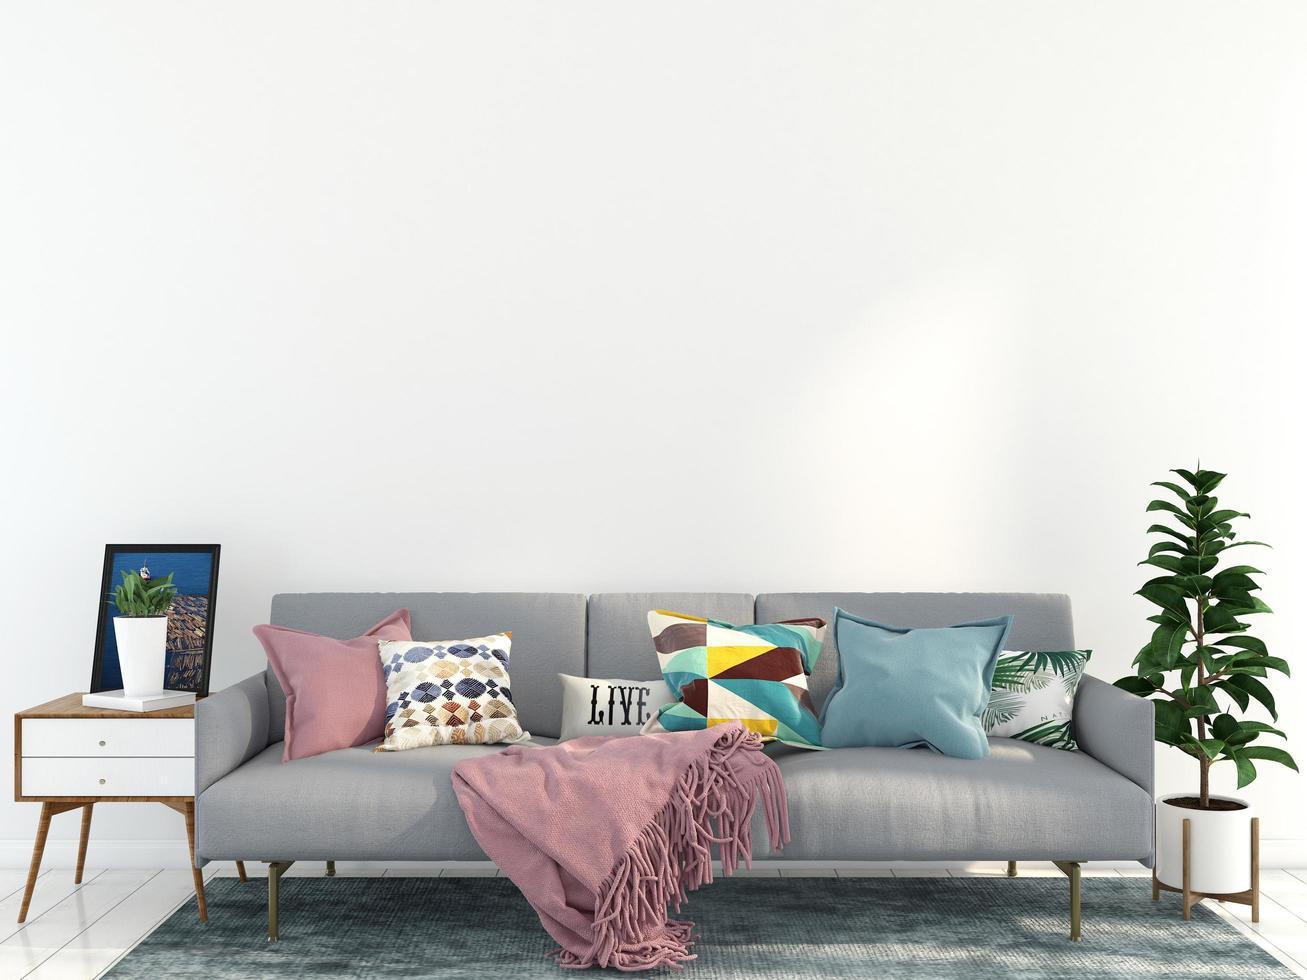 sofá gris en la sala de estar foto